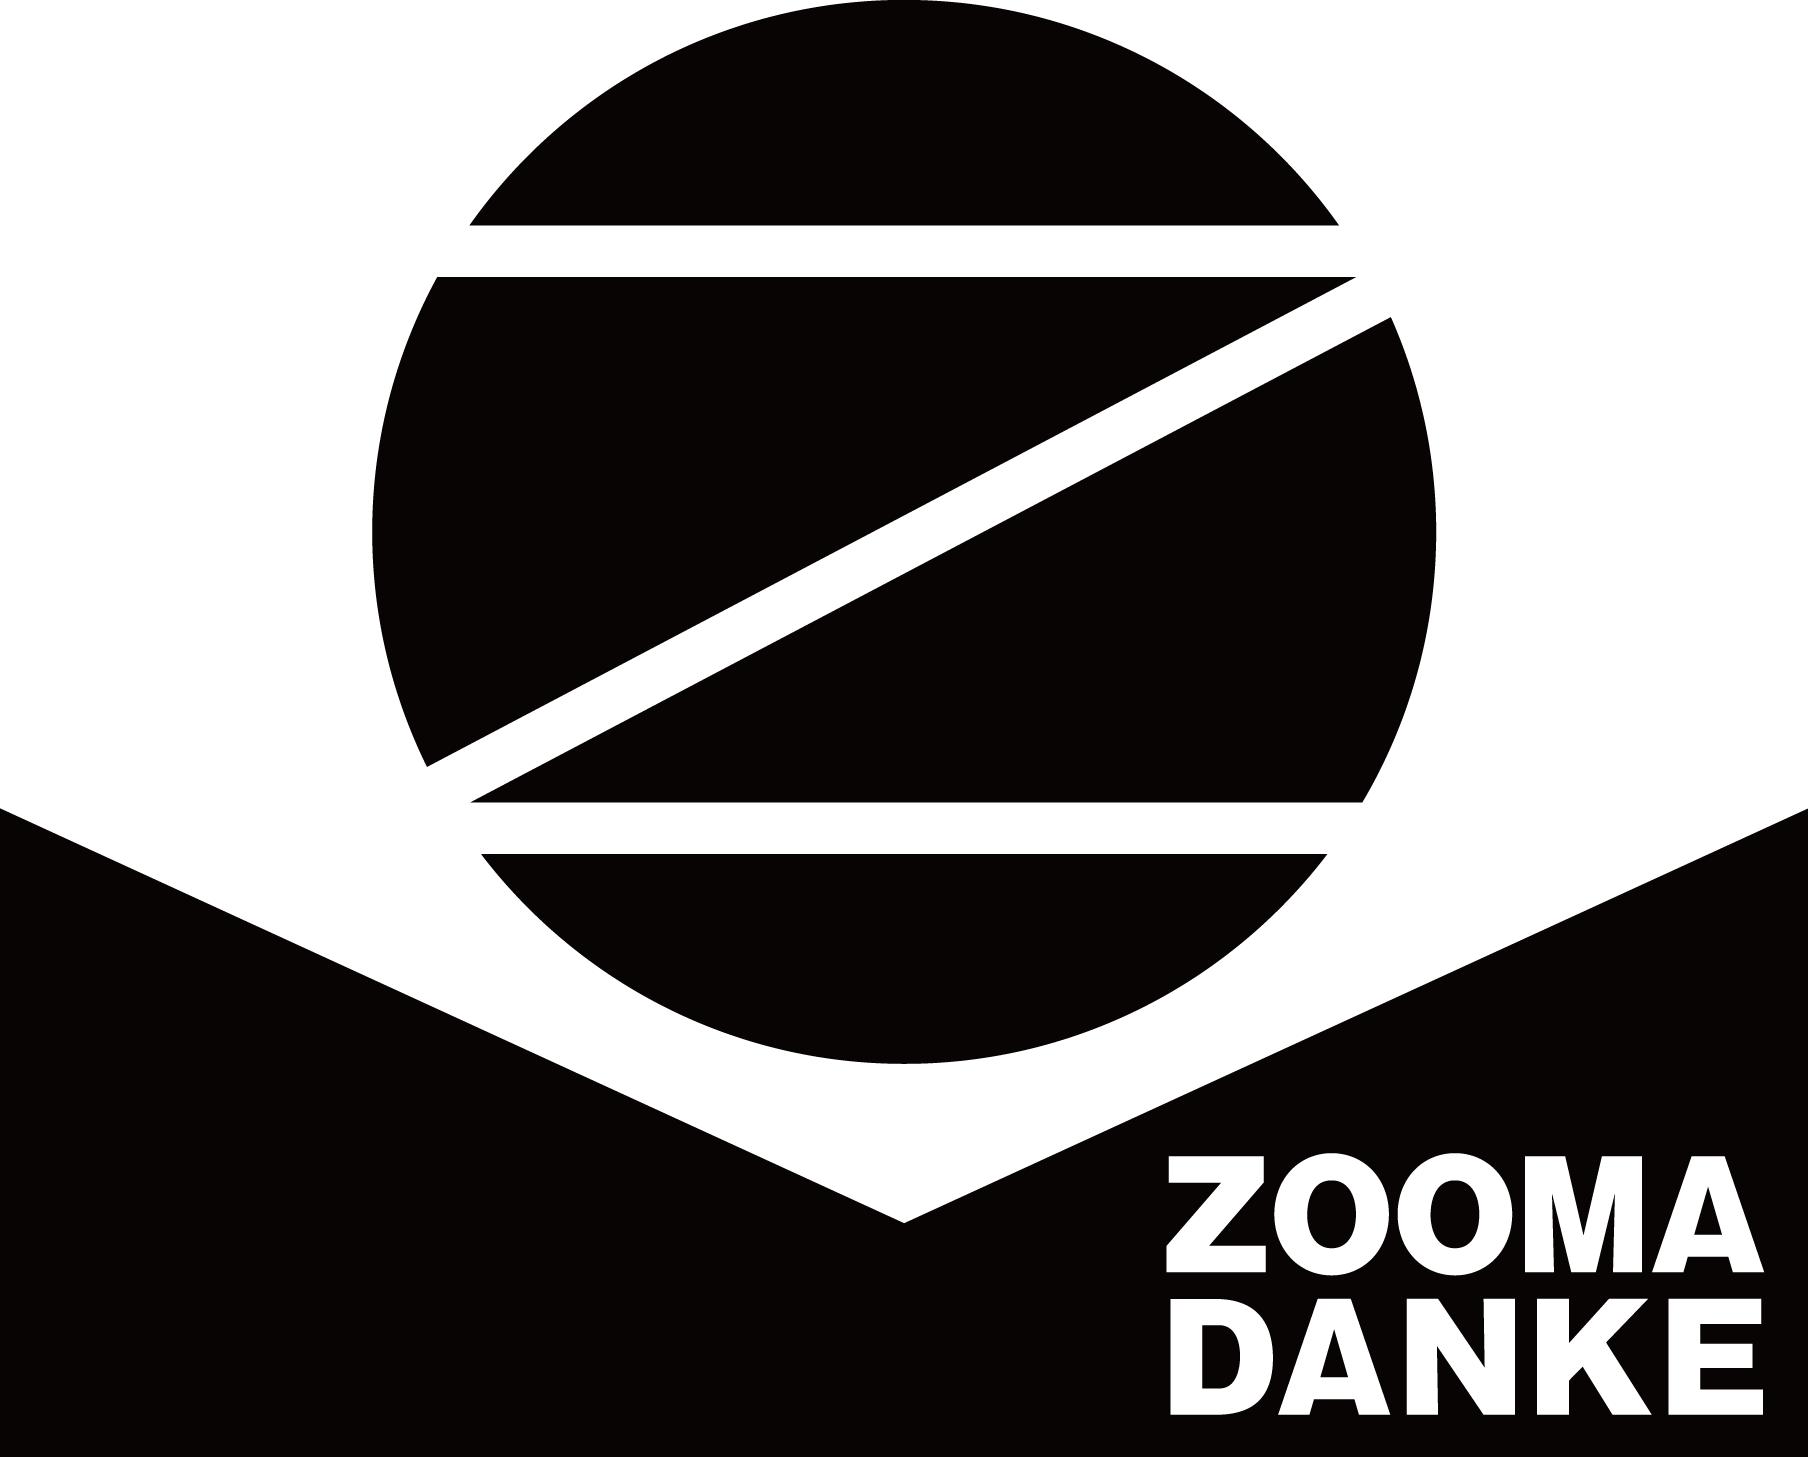 zooma logo